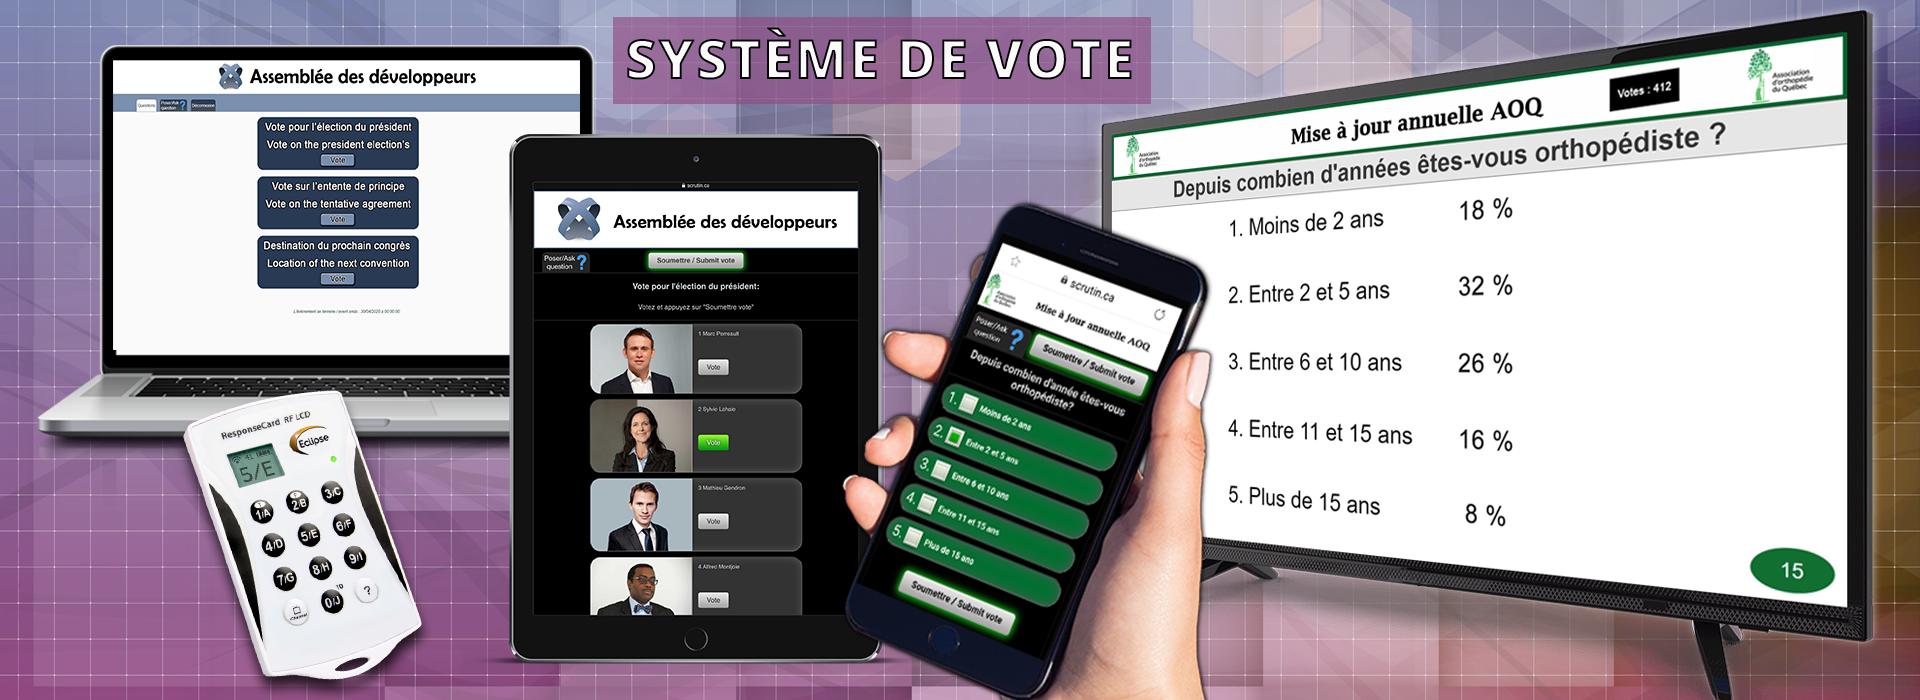 Eclipse Interactif Audiovisuel - Vote - Encan